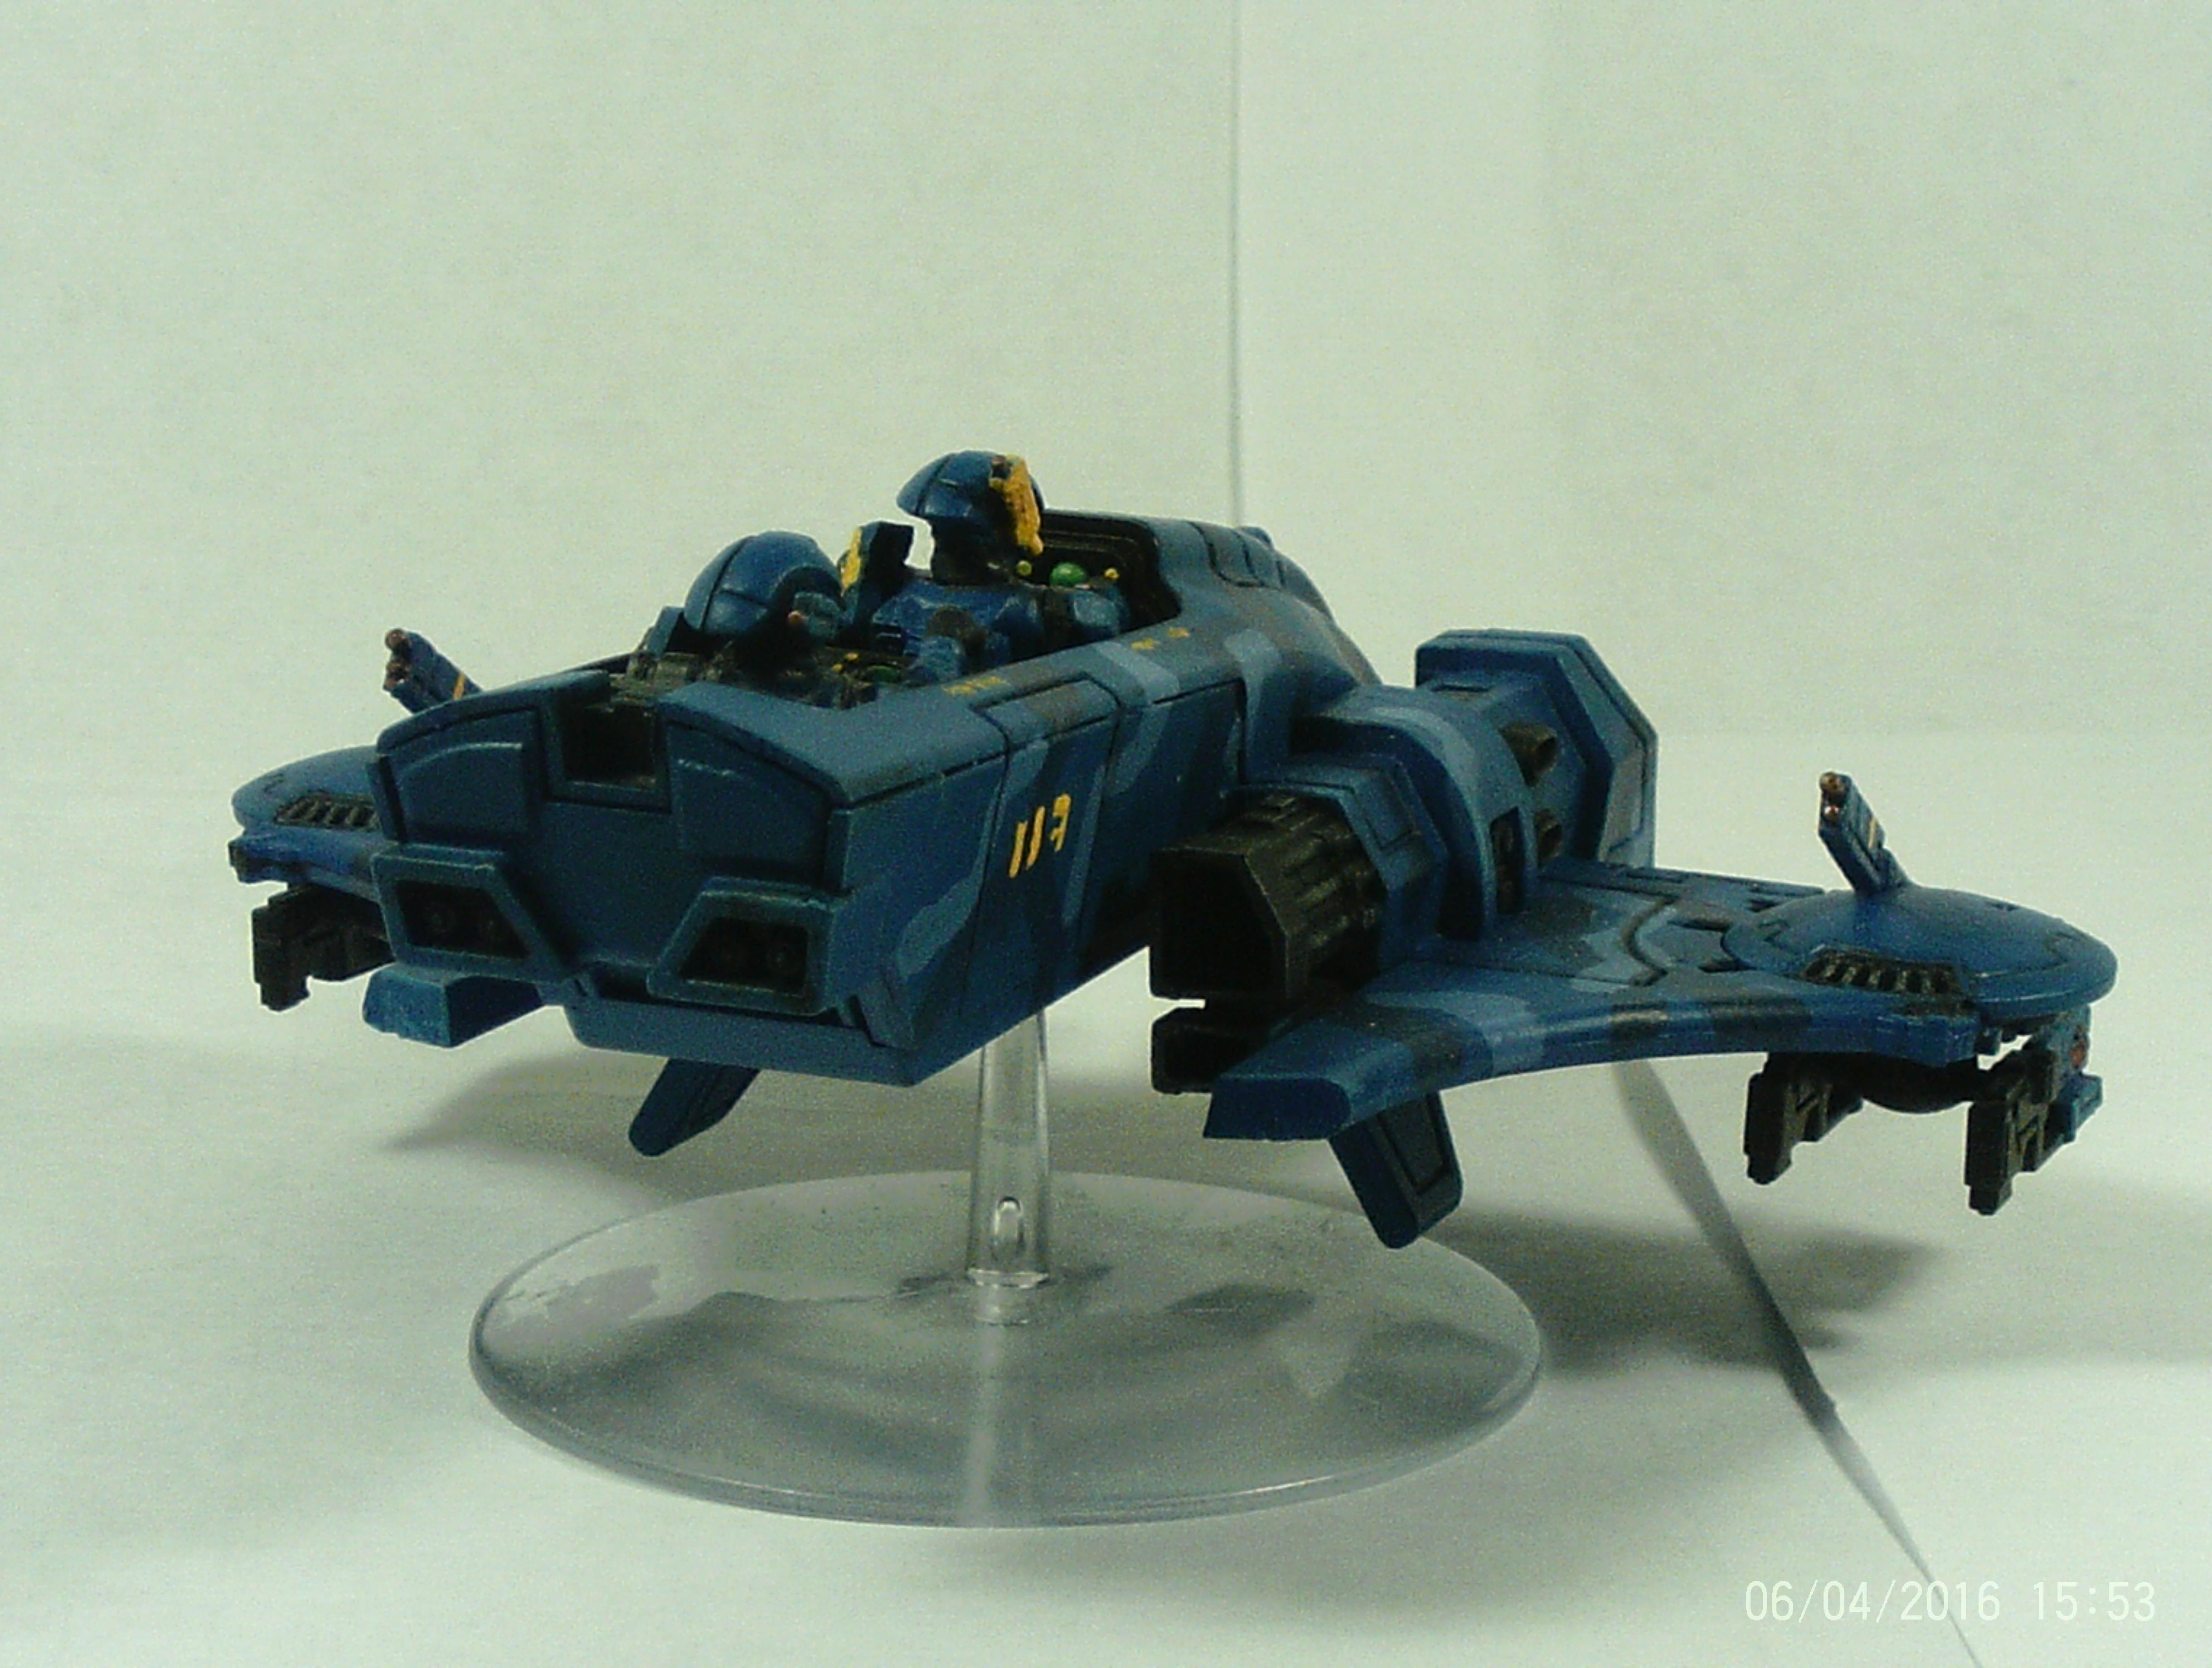 Blaster, Camouflage, Drones, Fast, Fire, Fusion, Piranha, Skimmer, Tau, Vehicle, Warriors